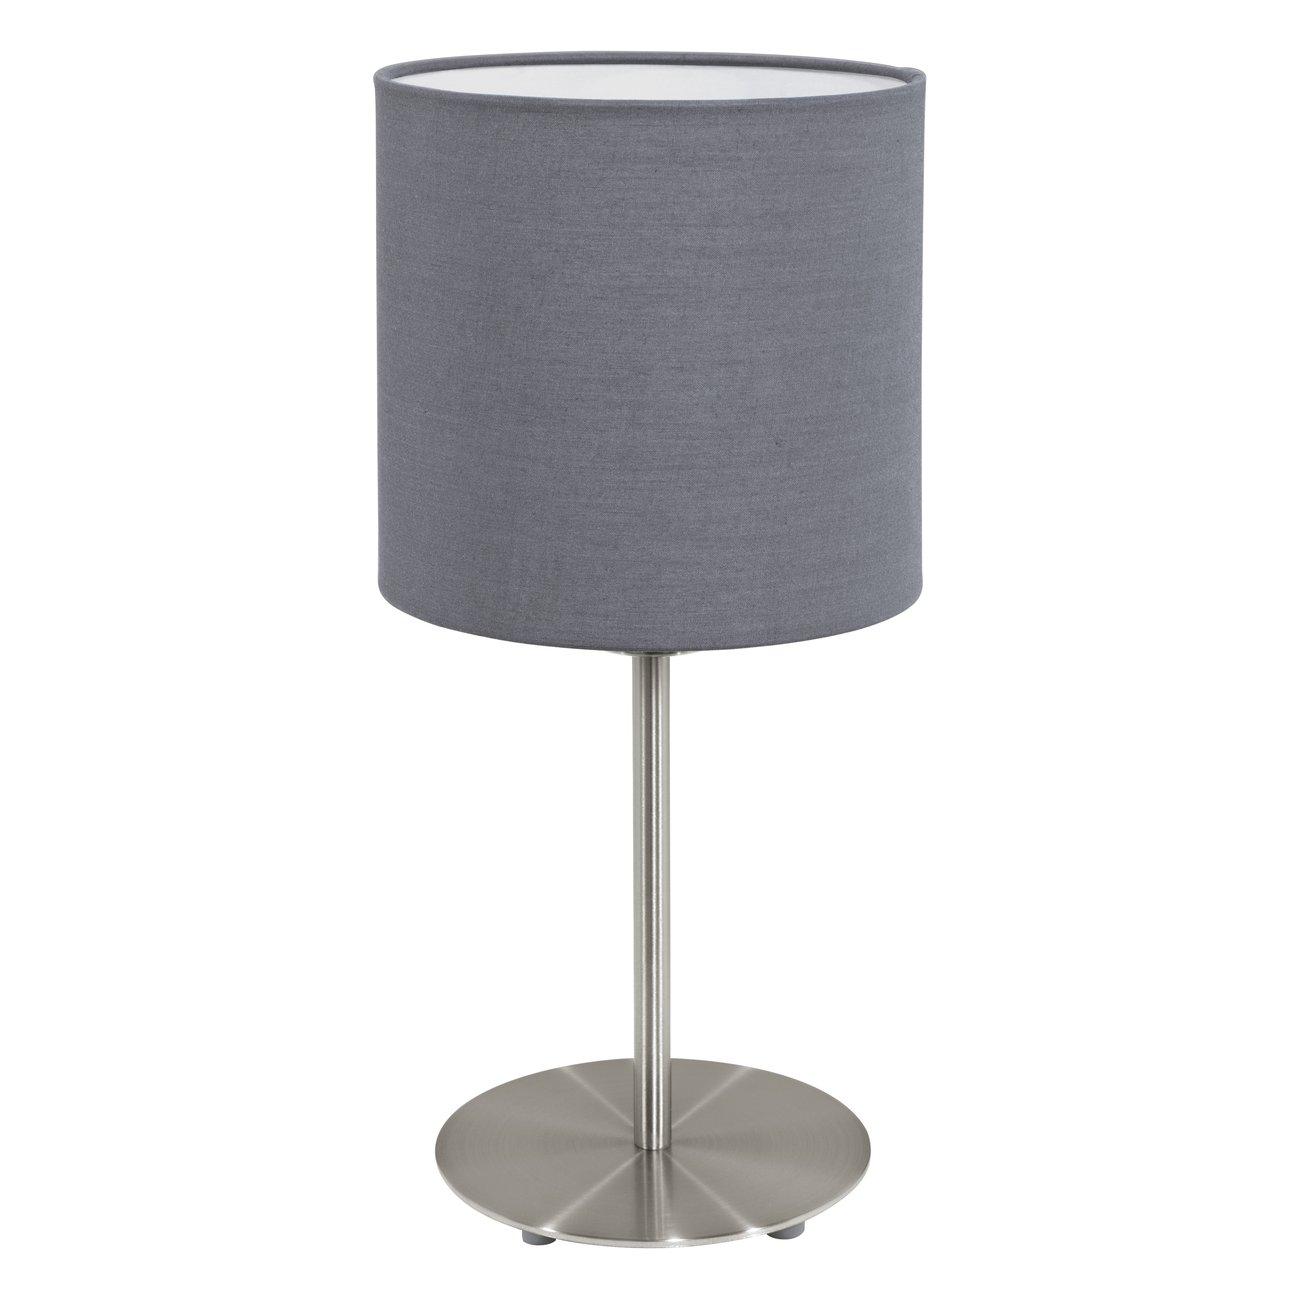 EGLO 95728 stolní lampa PASTERI E14 1x40W